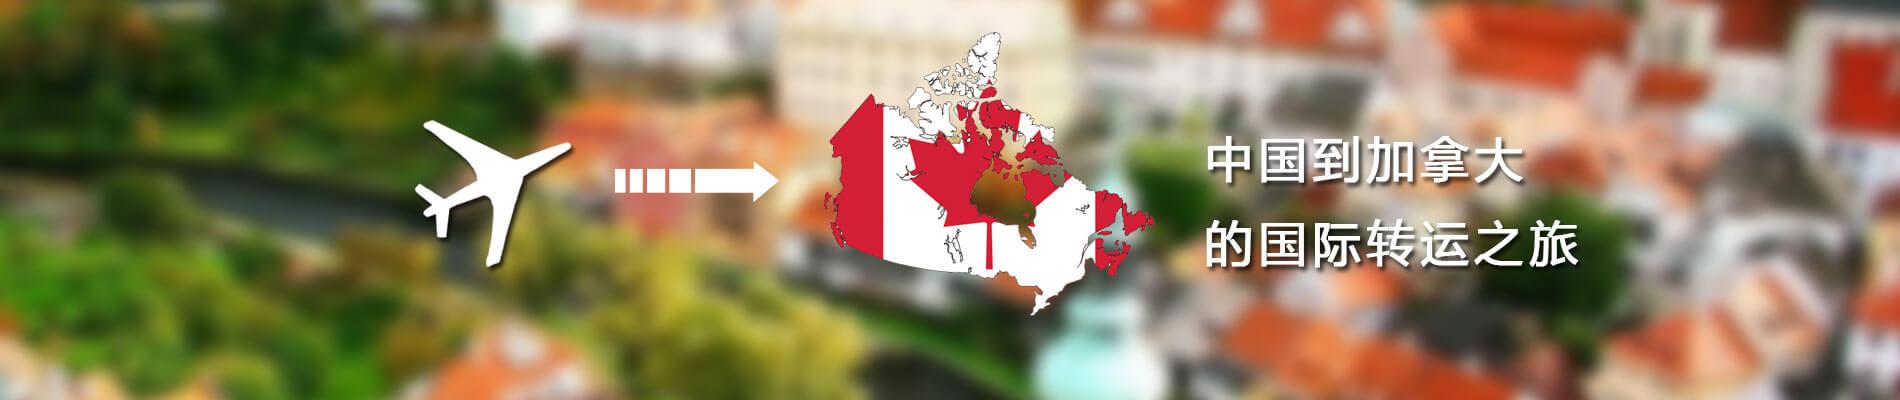 加拿大专题banner